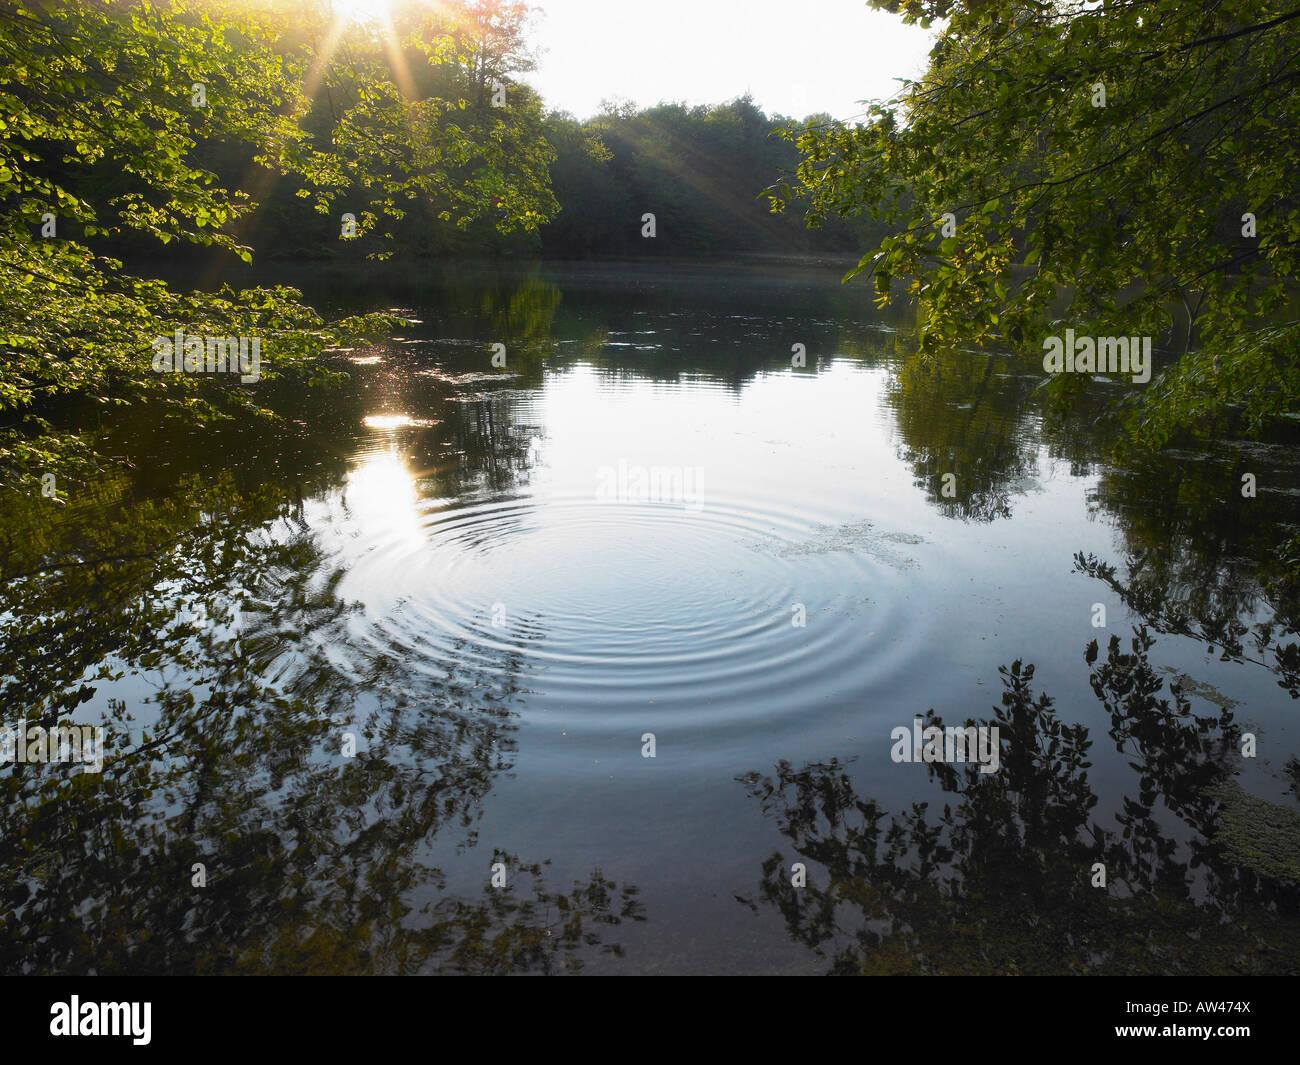 Rätsel auf einem See. Stockbild